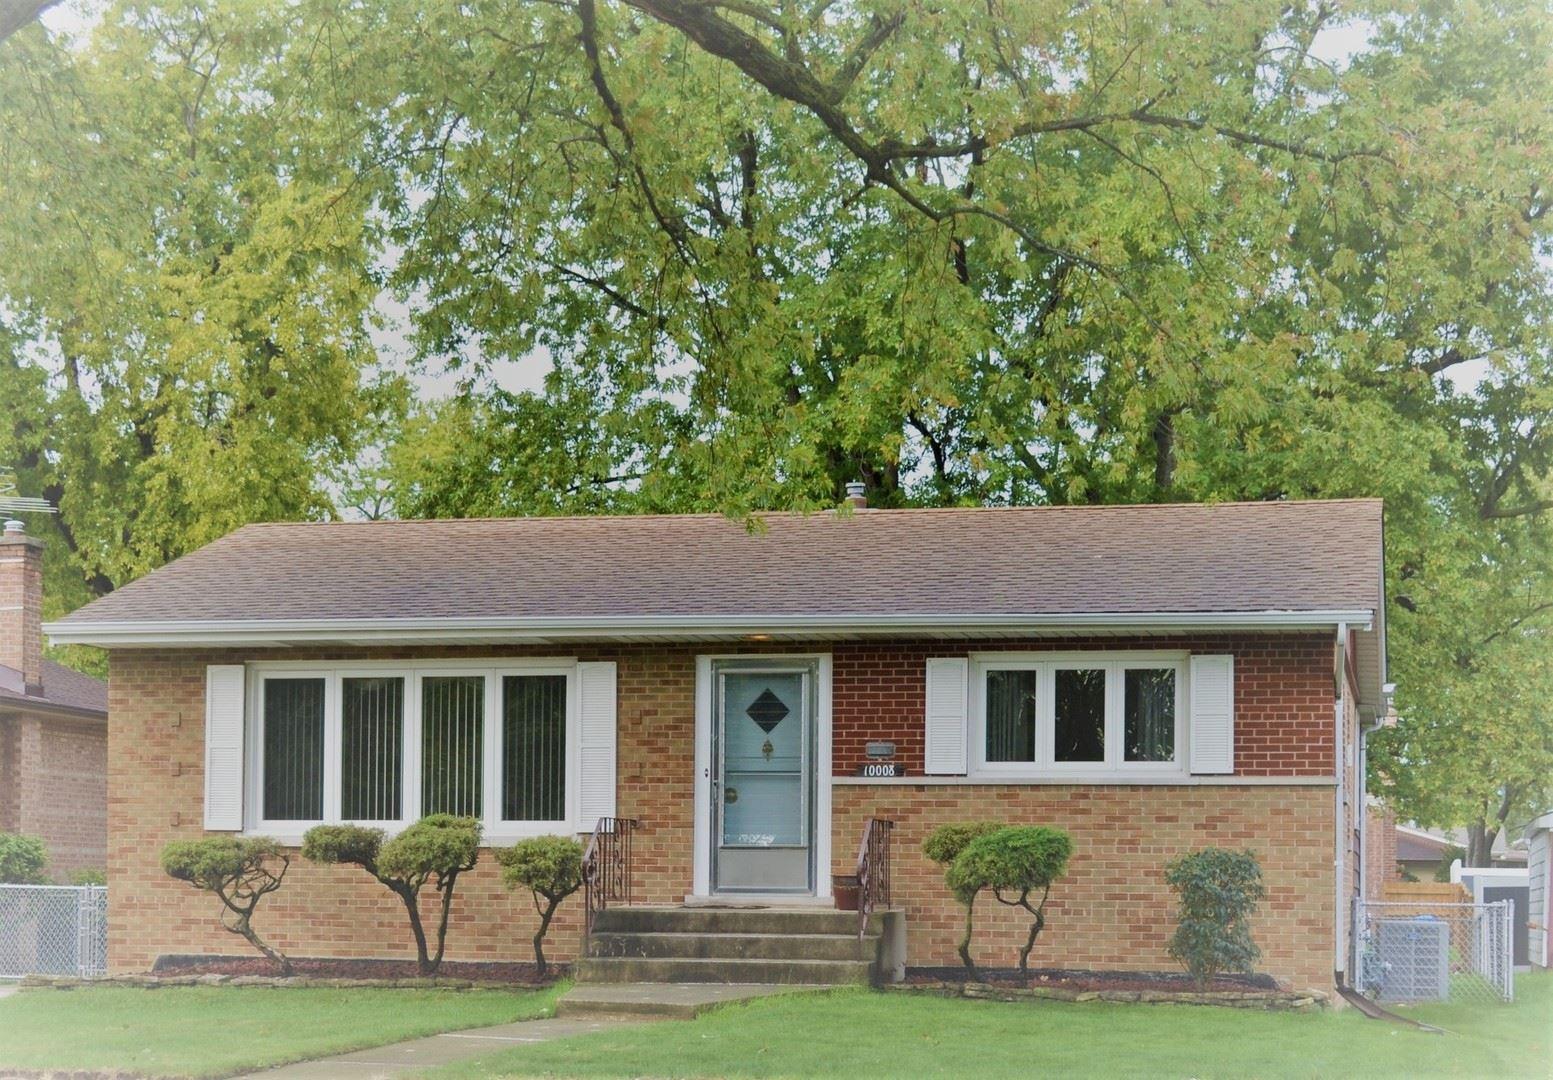 10008 S 52nd Avenue, Oak Lawn, IL 60453 - #: 11247031